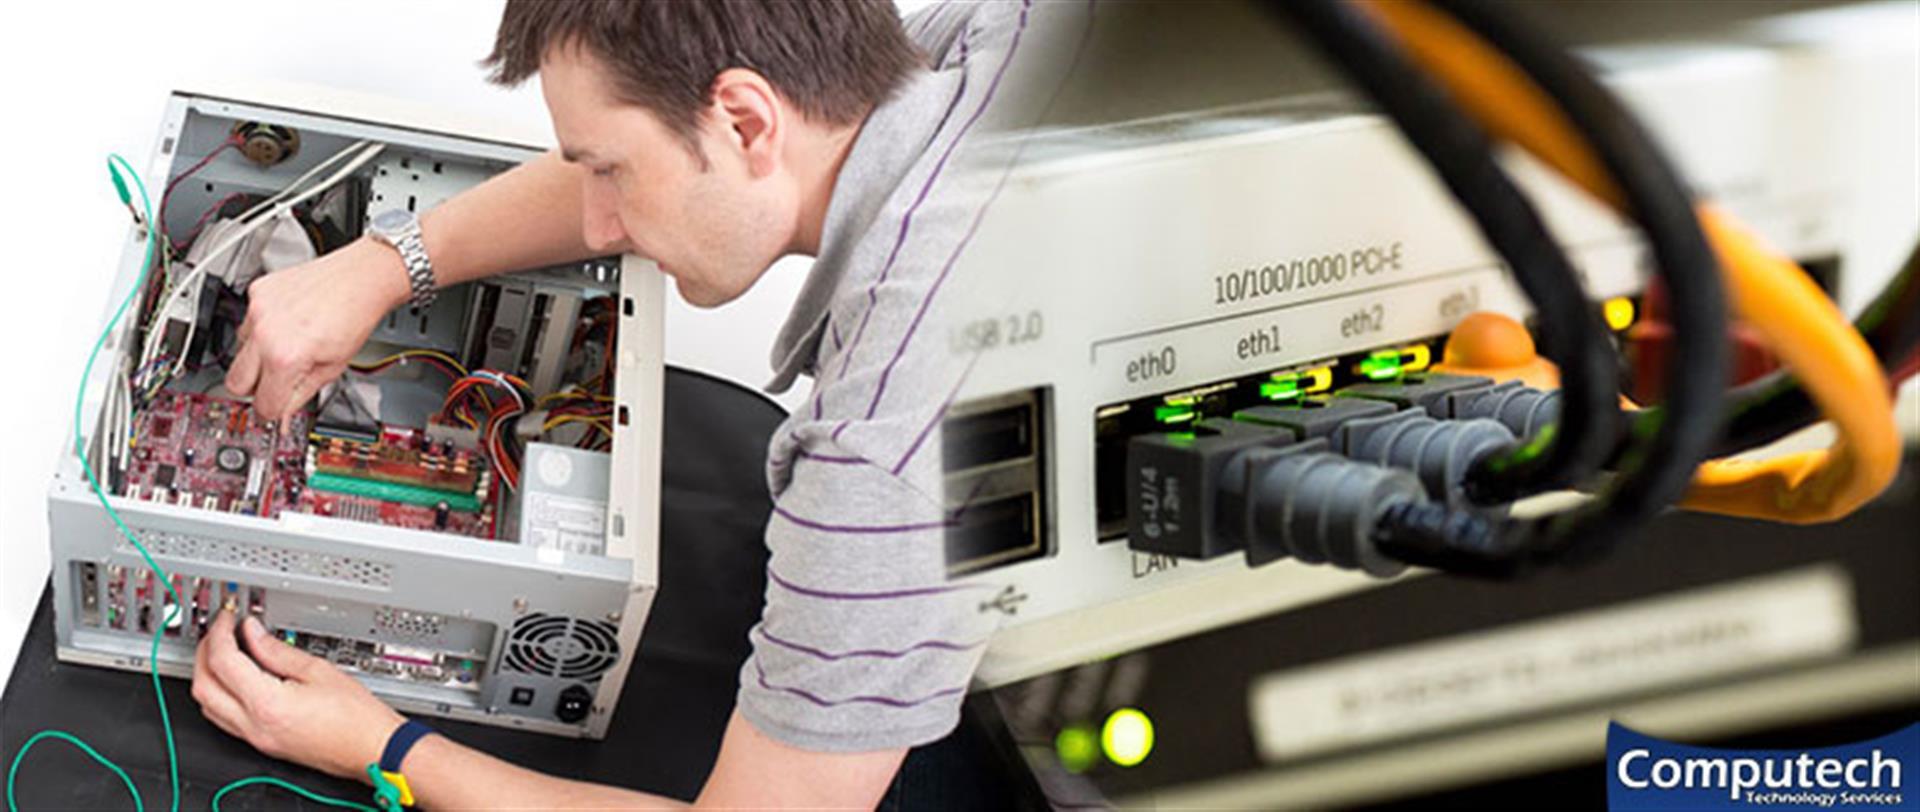 Brent Alabama On-Site PC & Printer Repair, Network, Telecom & Data Wiring Services